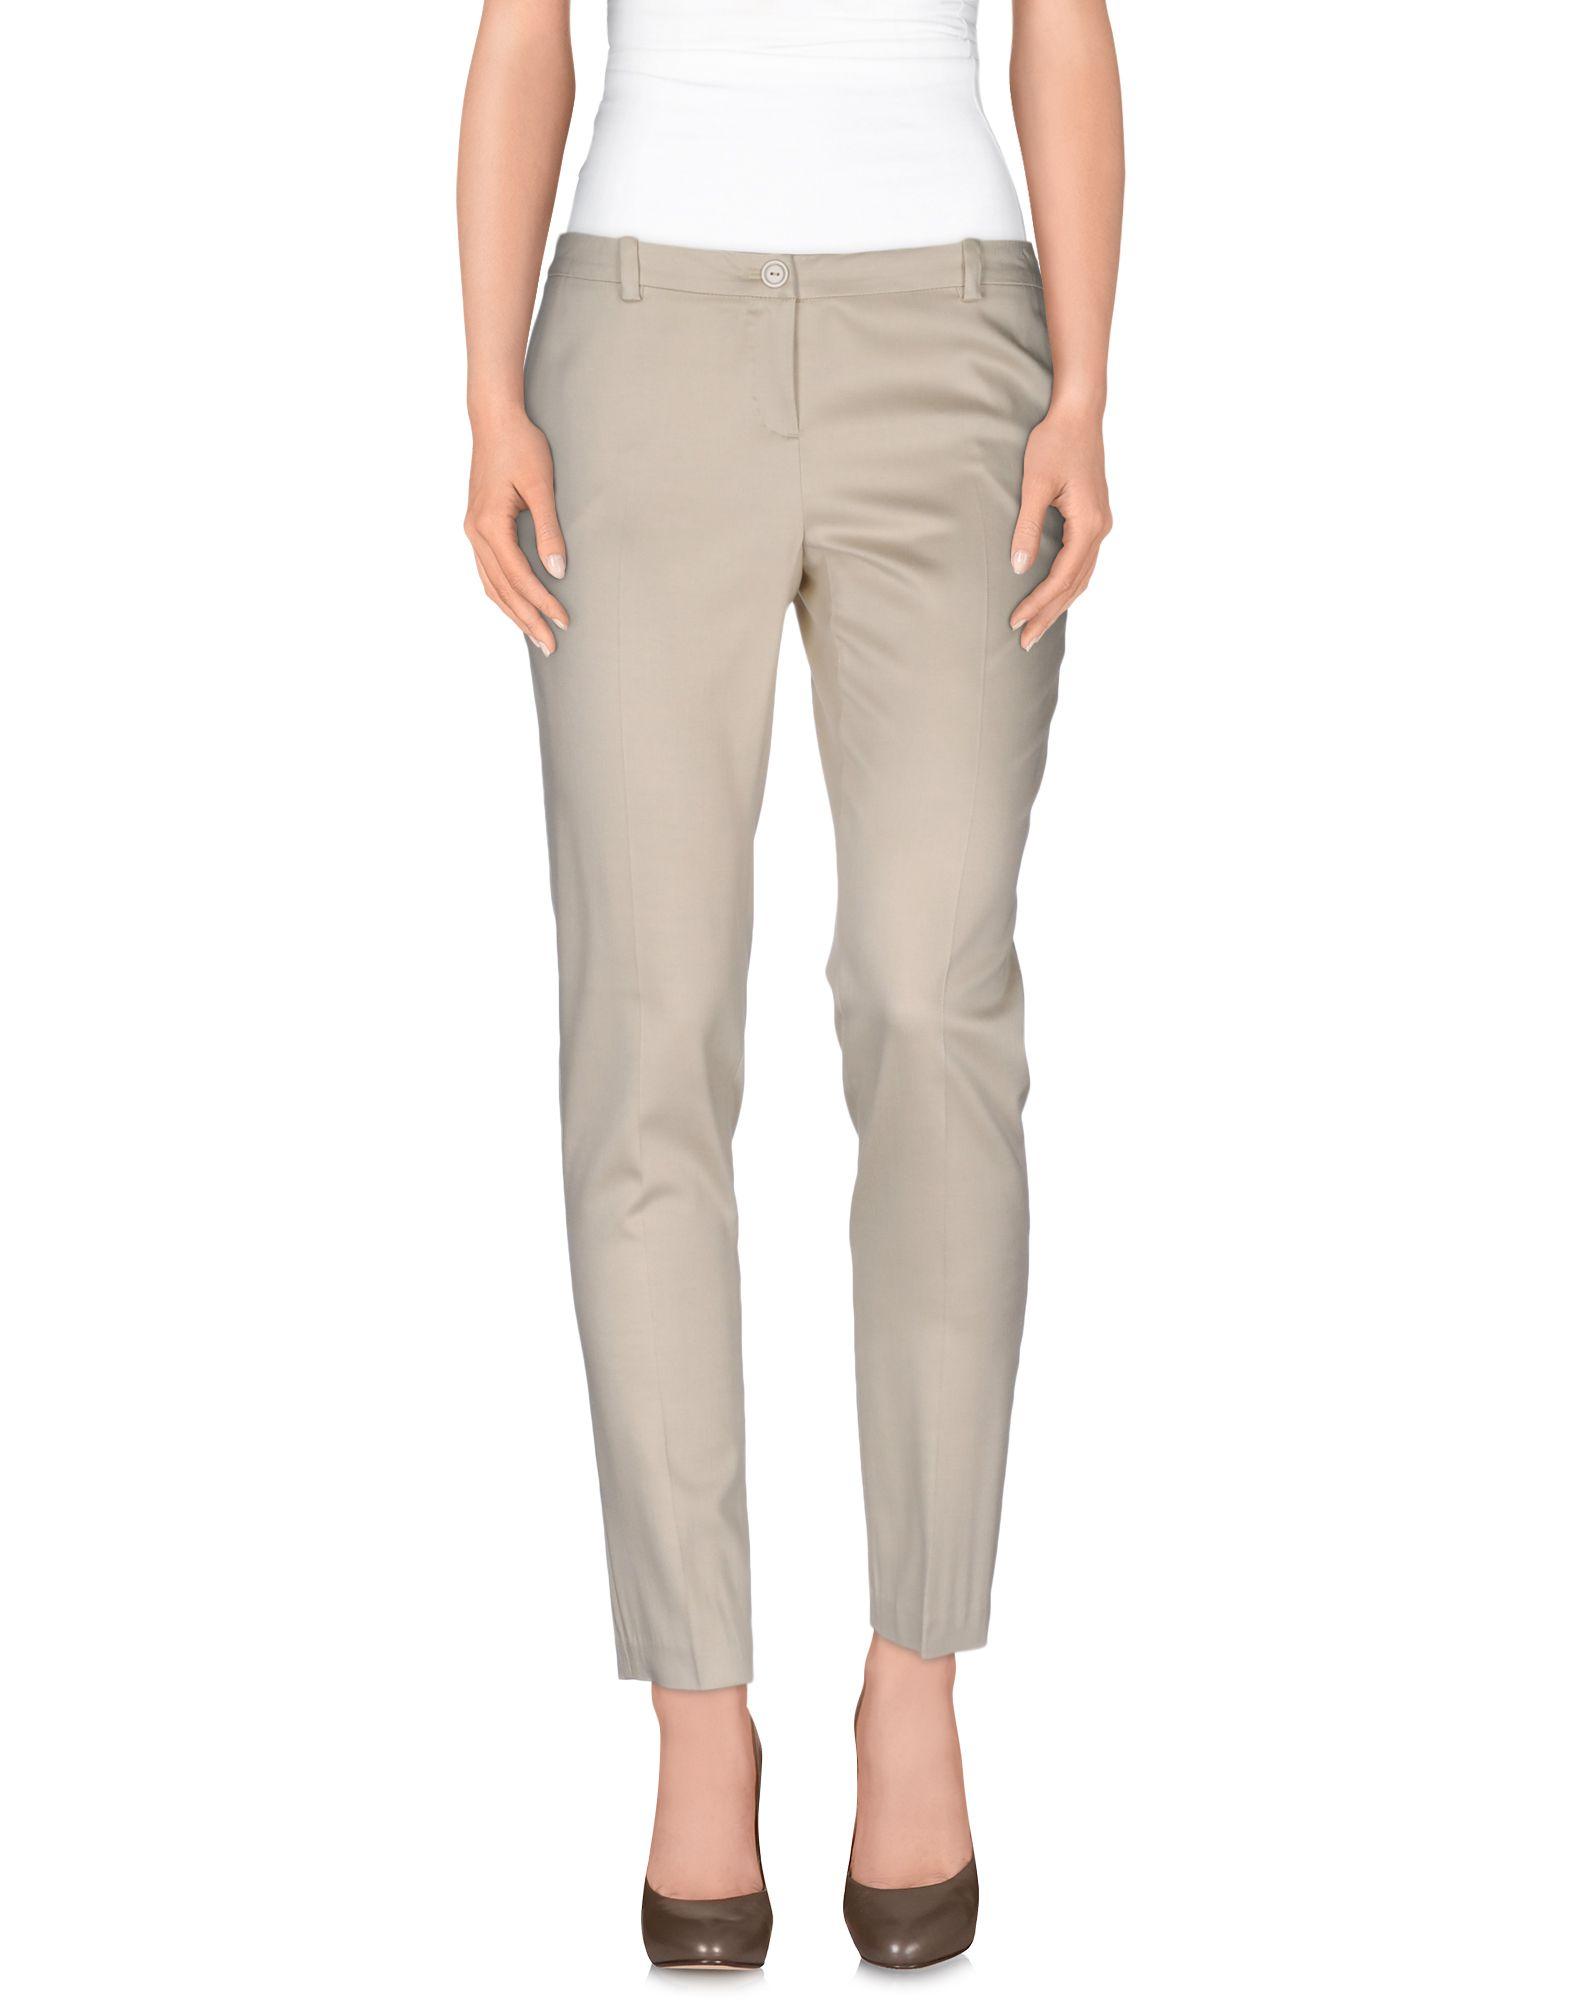 ANIYE BY Damen Hose Farbe Beige Größe 4